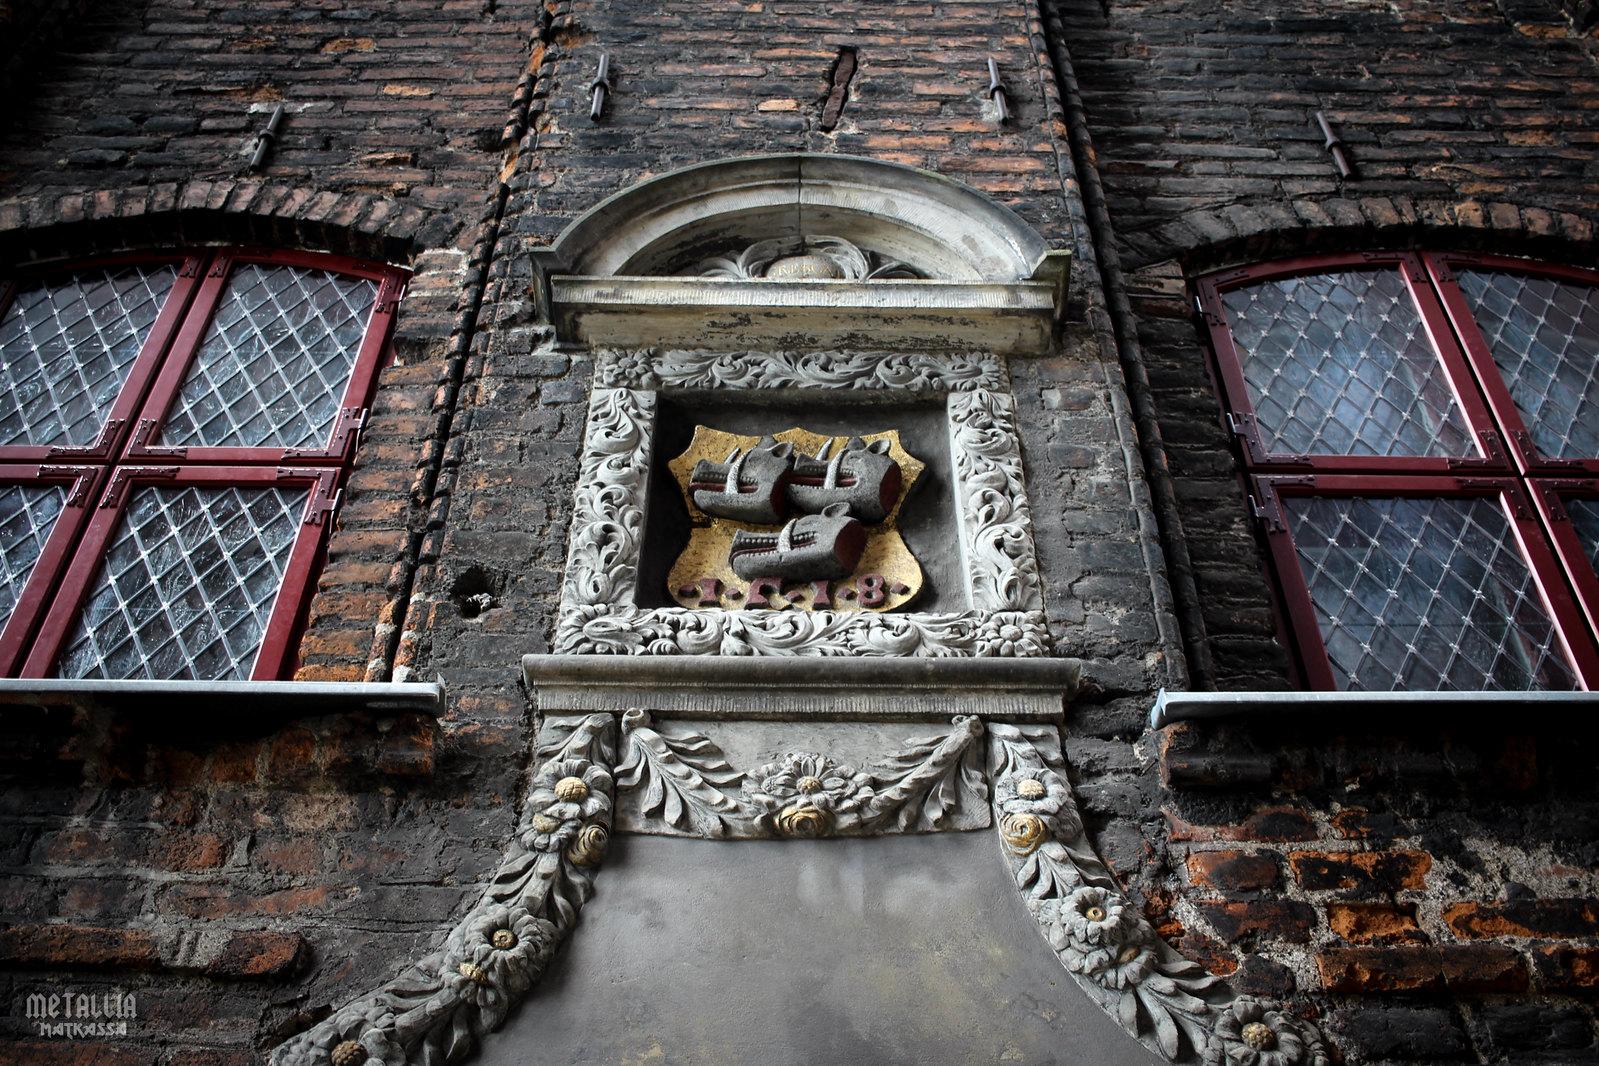 gdansk, gdanskin vanha kaupunki, gdansk old town, gdansk stare miasto, st. mary's basilica